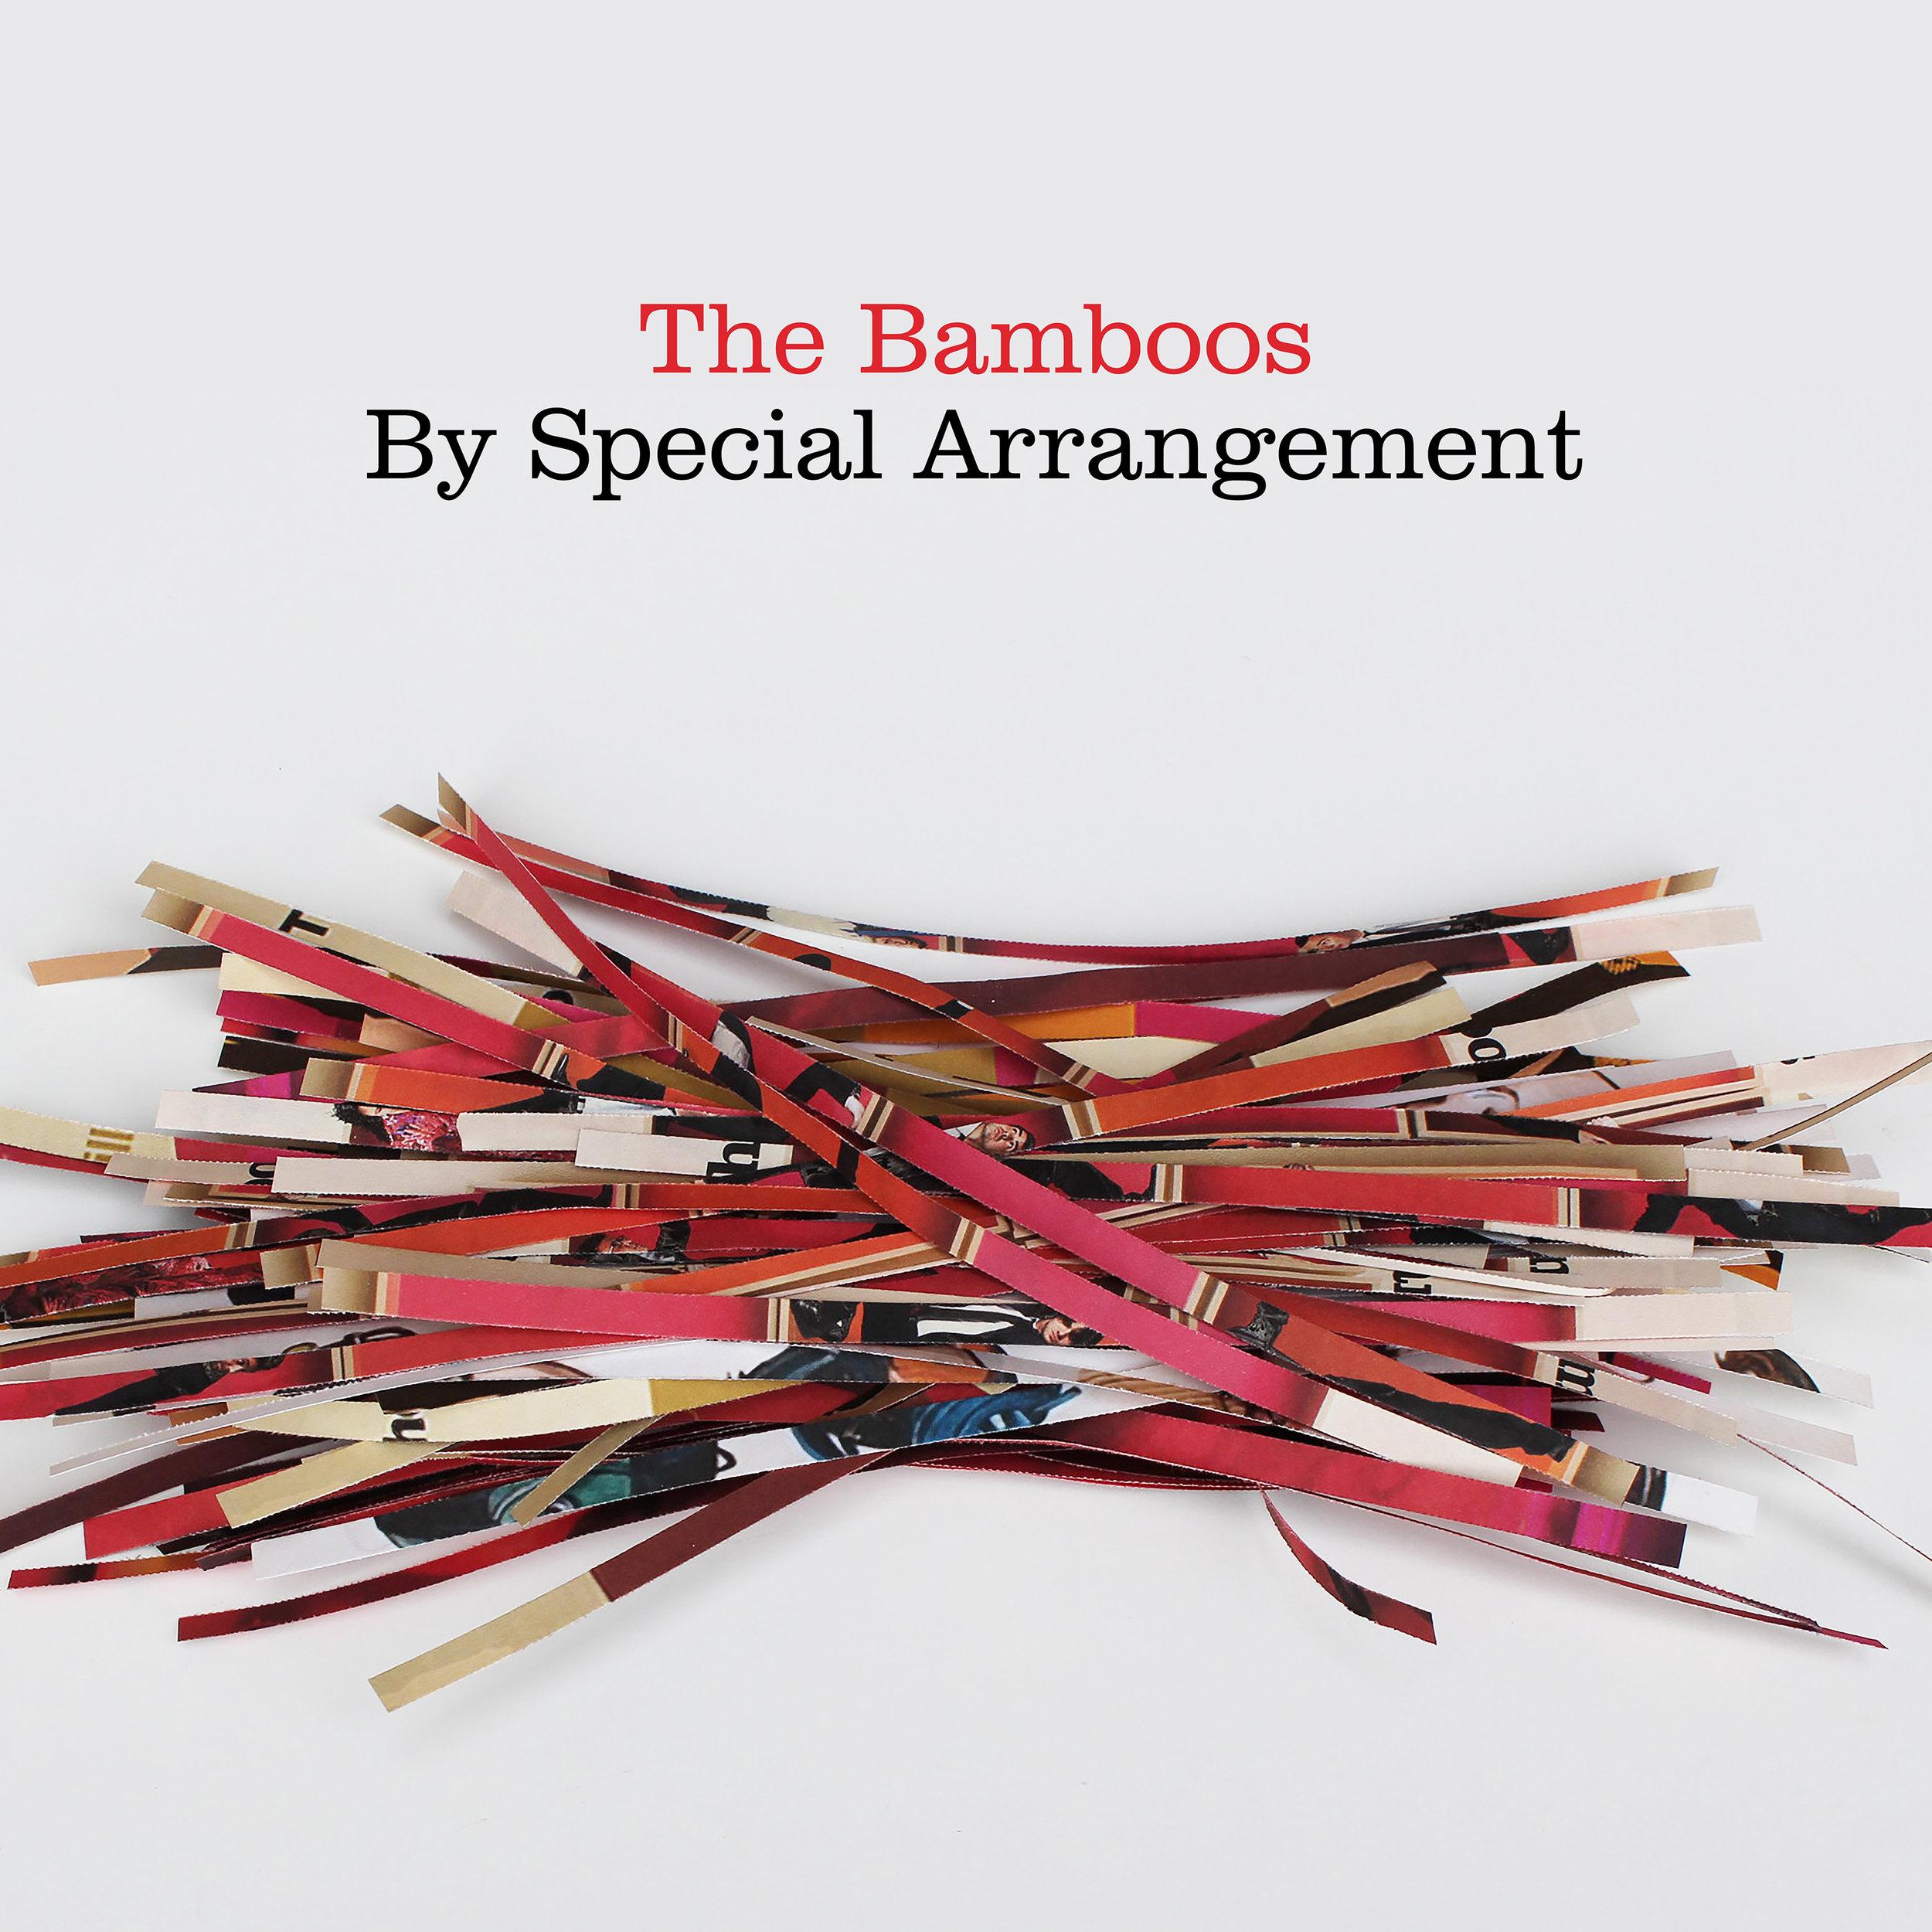 TheBamboosDigitalAlbum.jpg